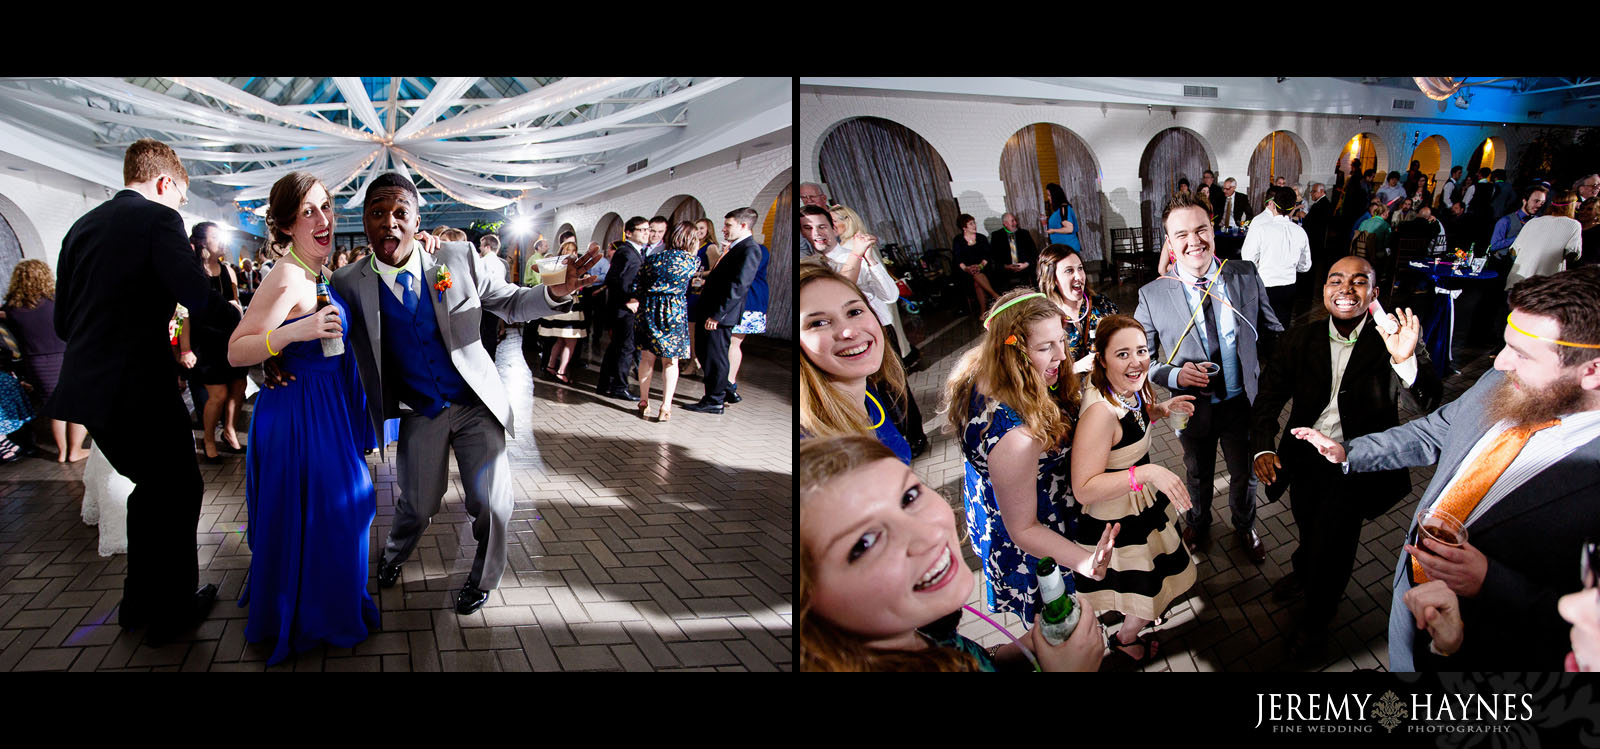 pipers-at-the-marott-wedding-reception-dancing-indianapolis-wedding.jpg